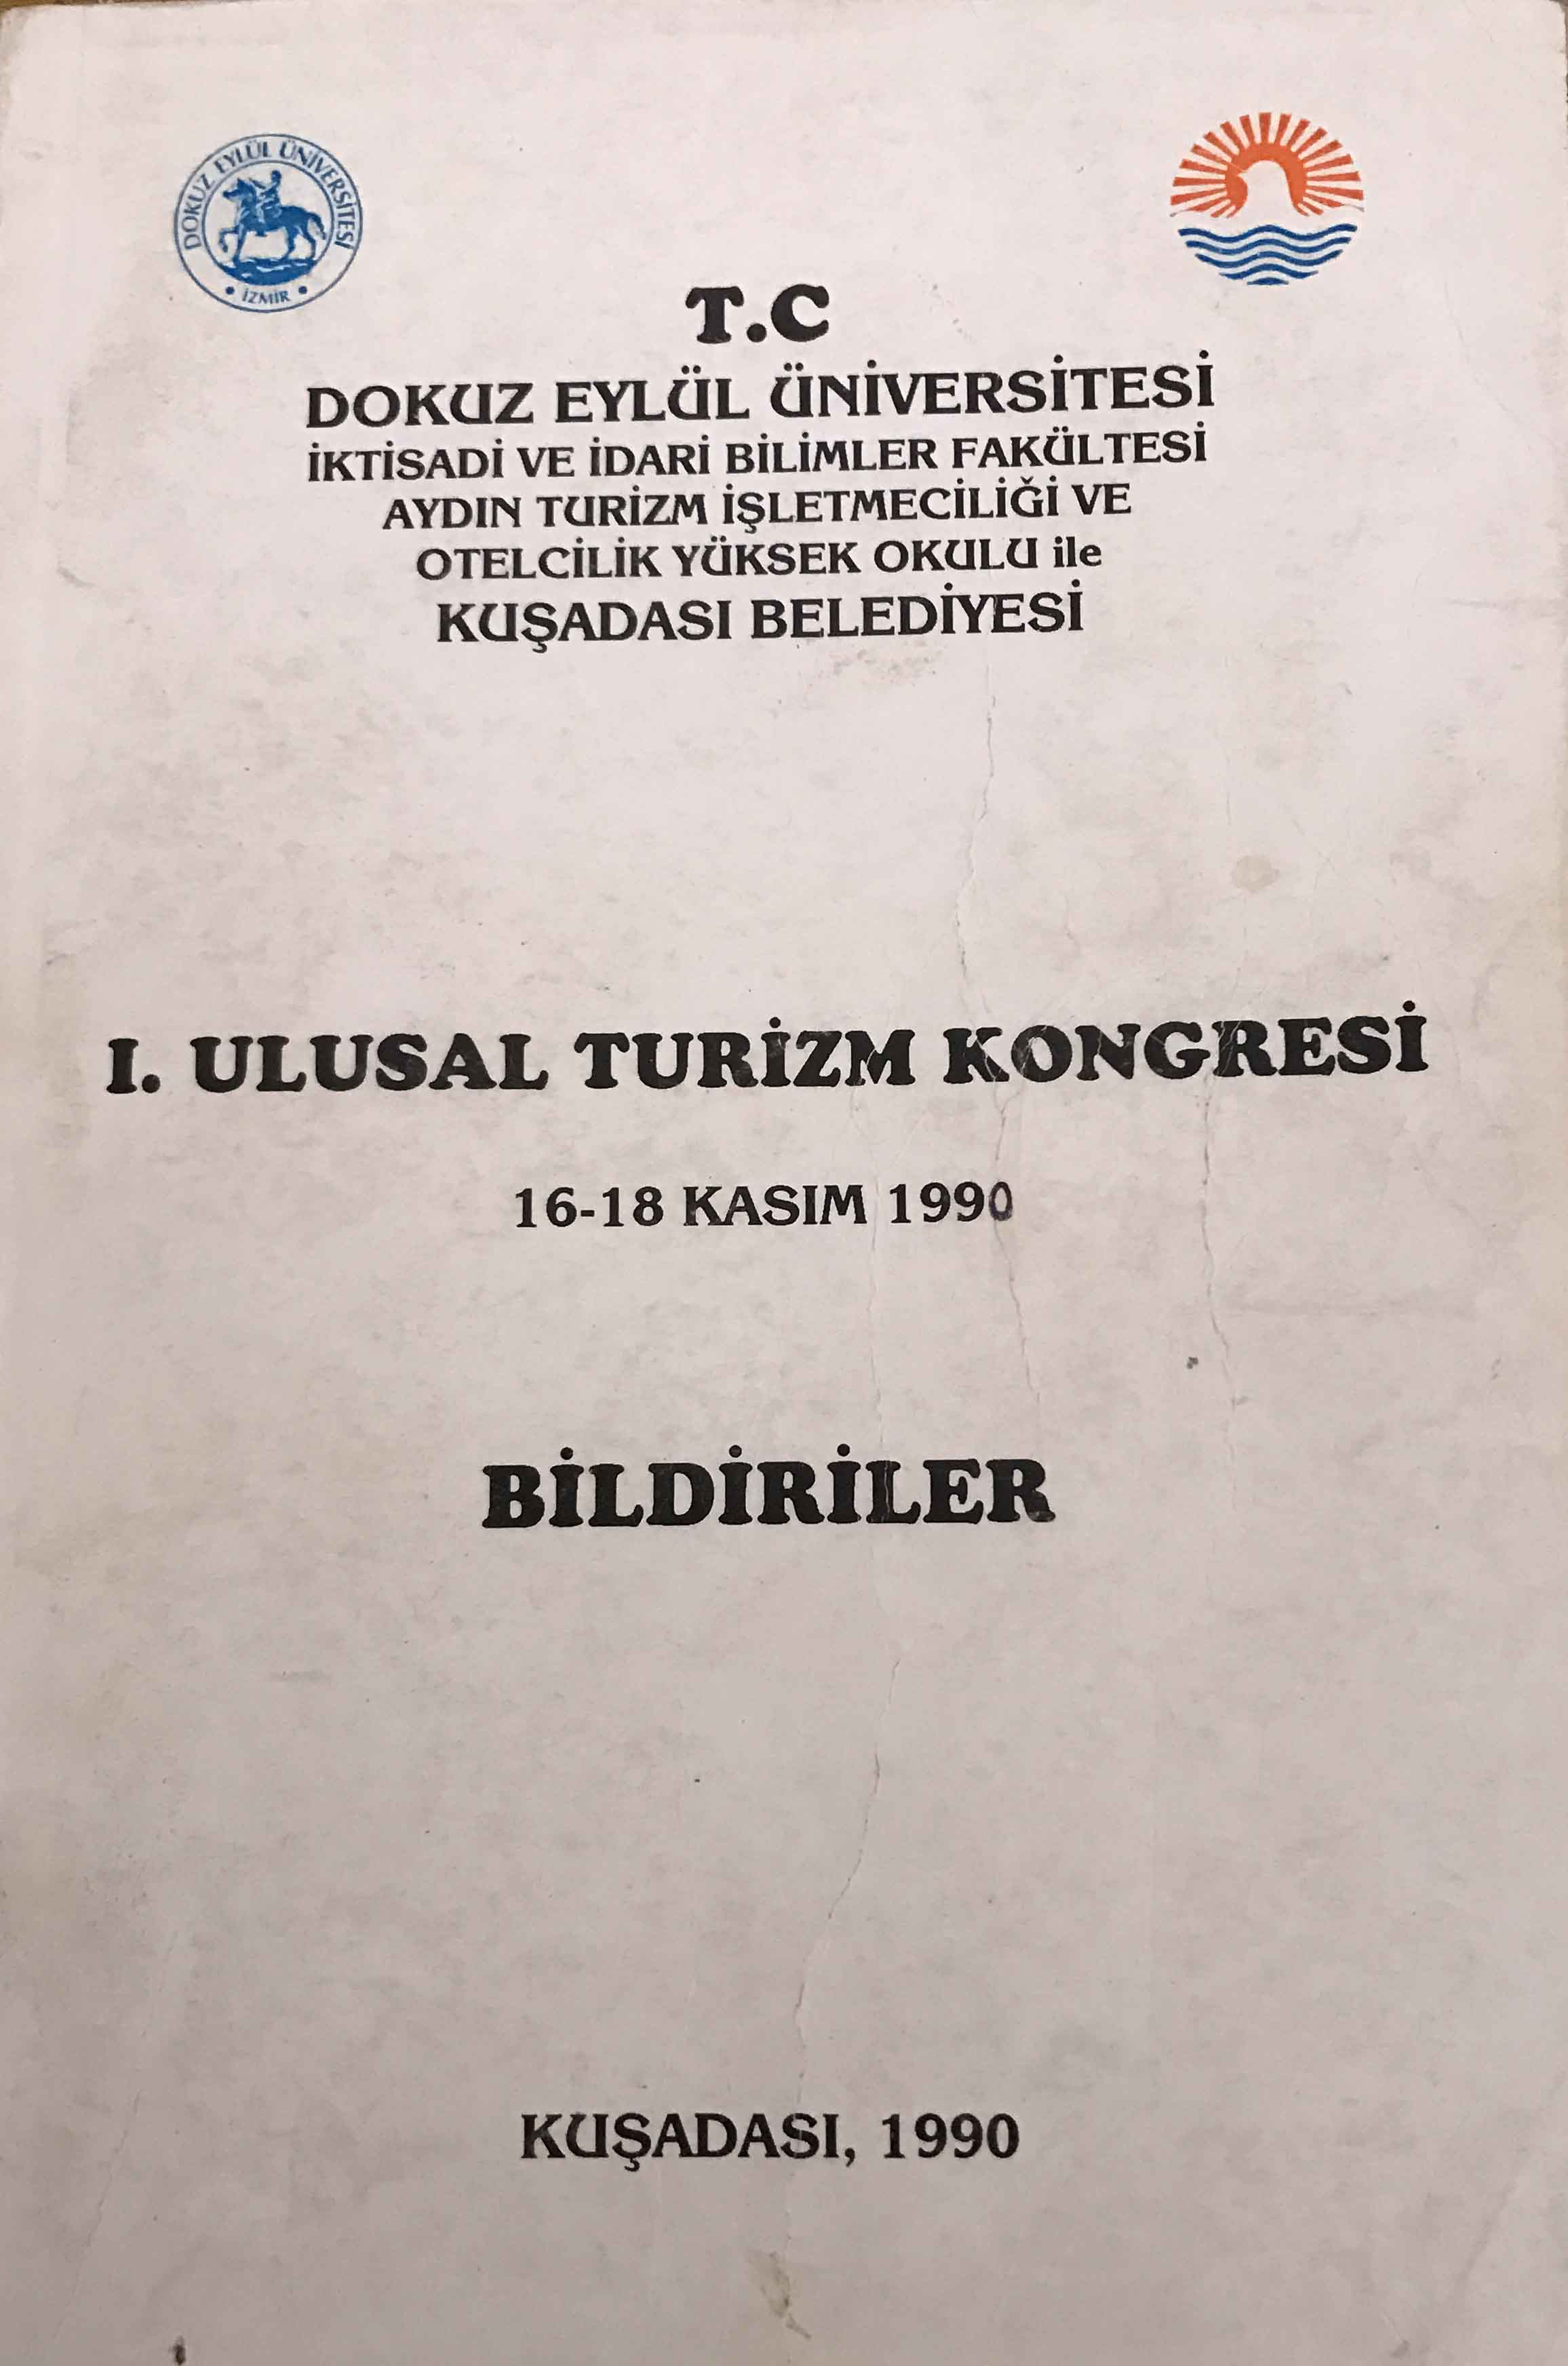 I. Ulusal Turizm Kongresi Kitap Kapağı